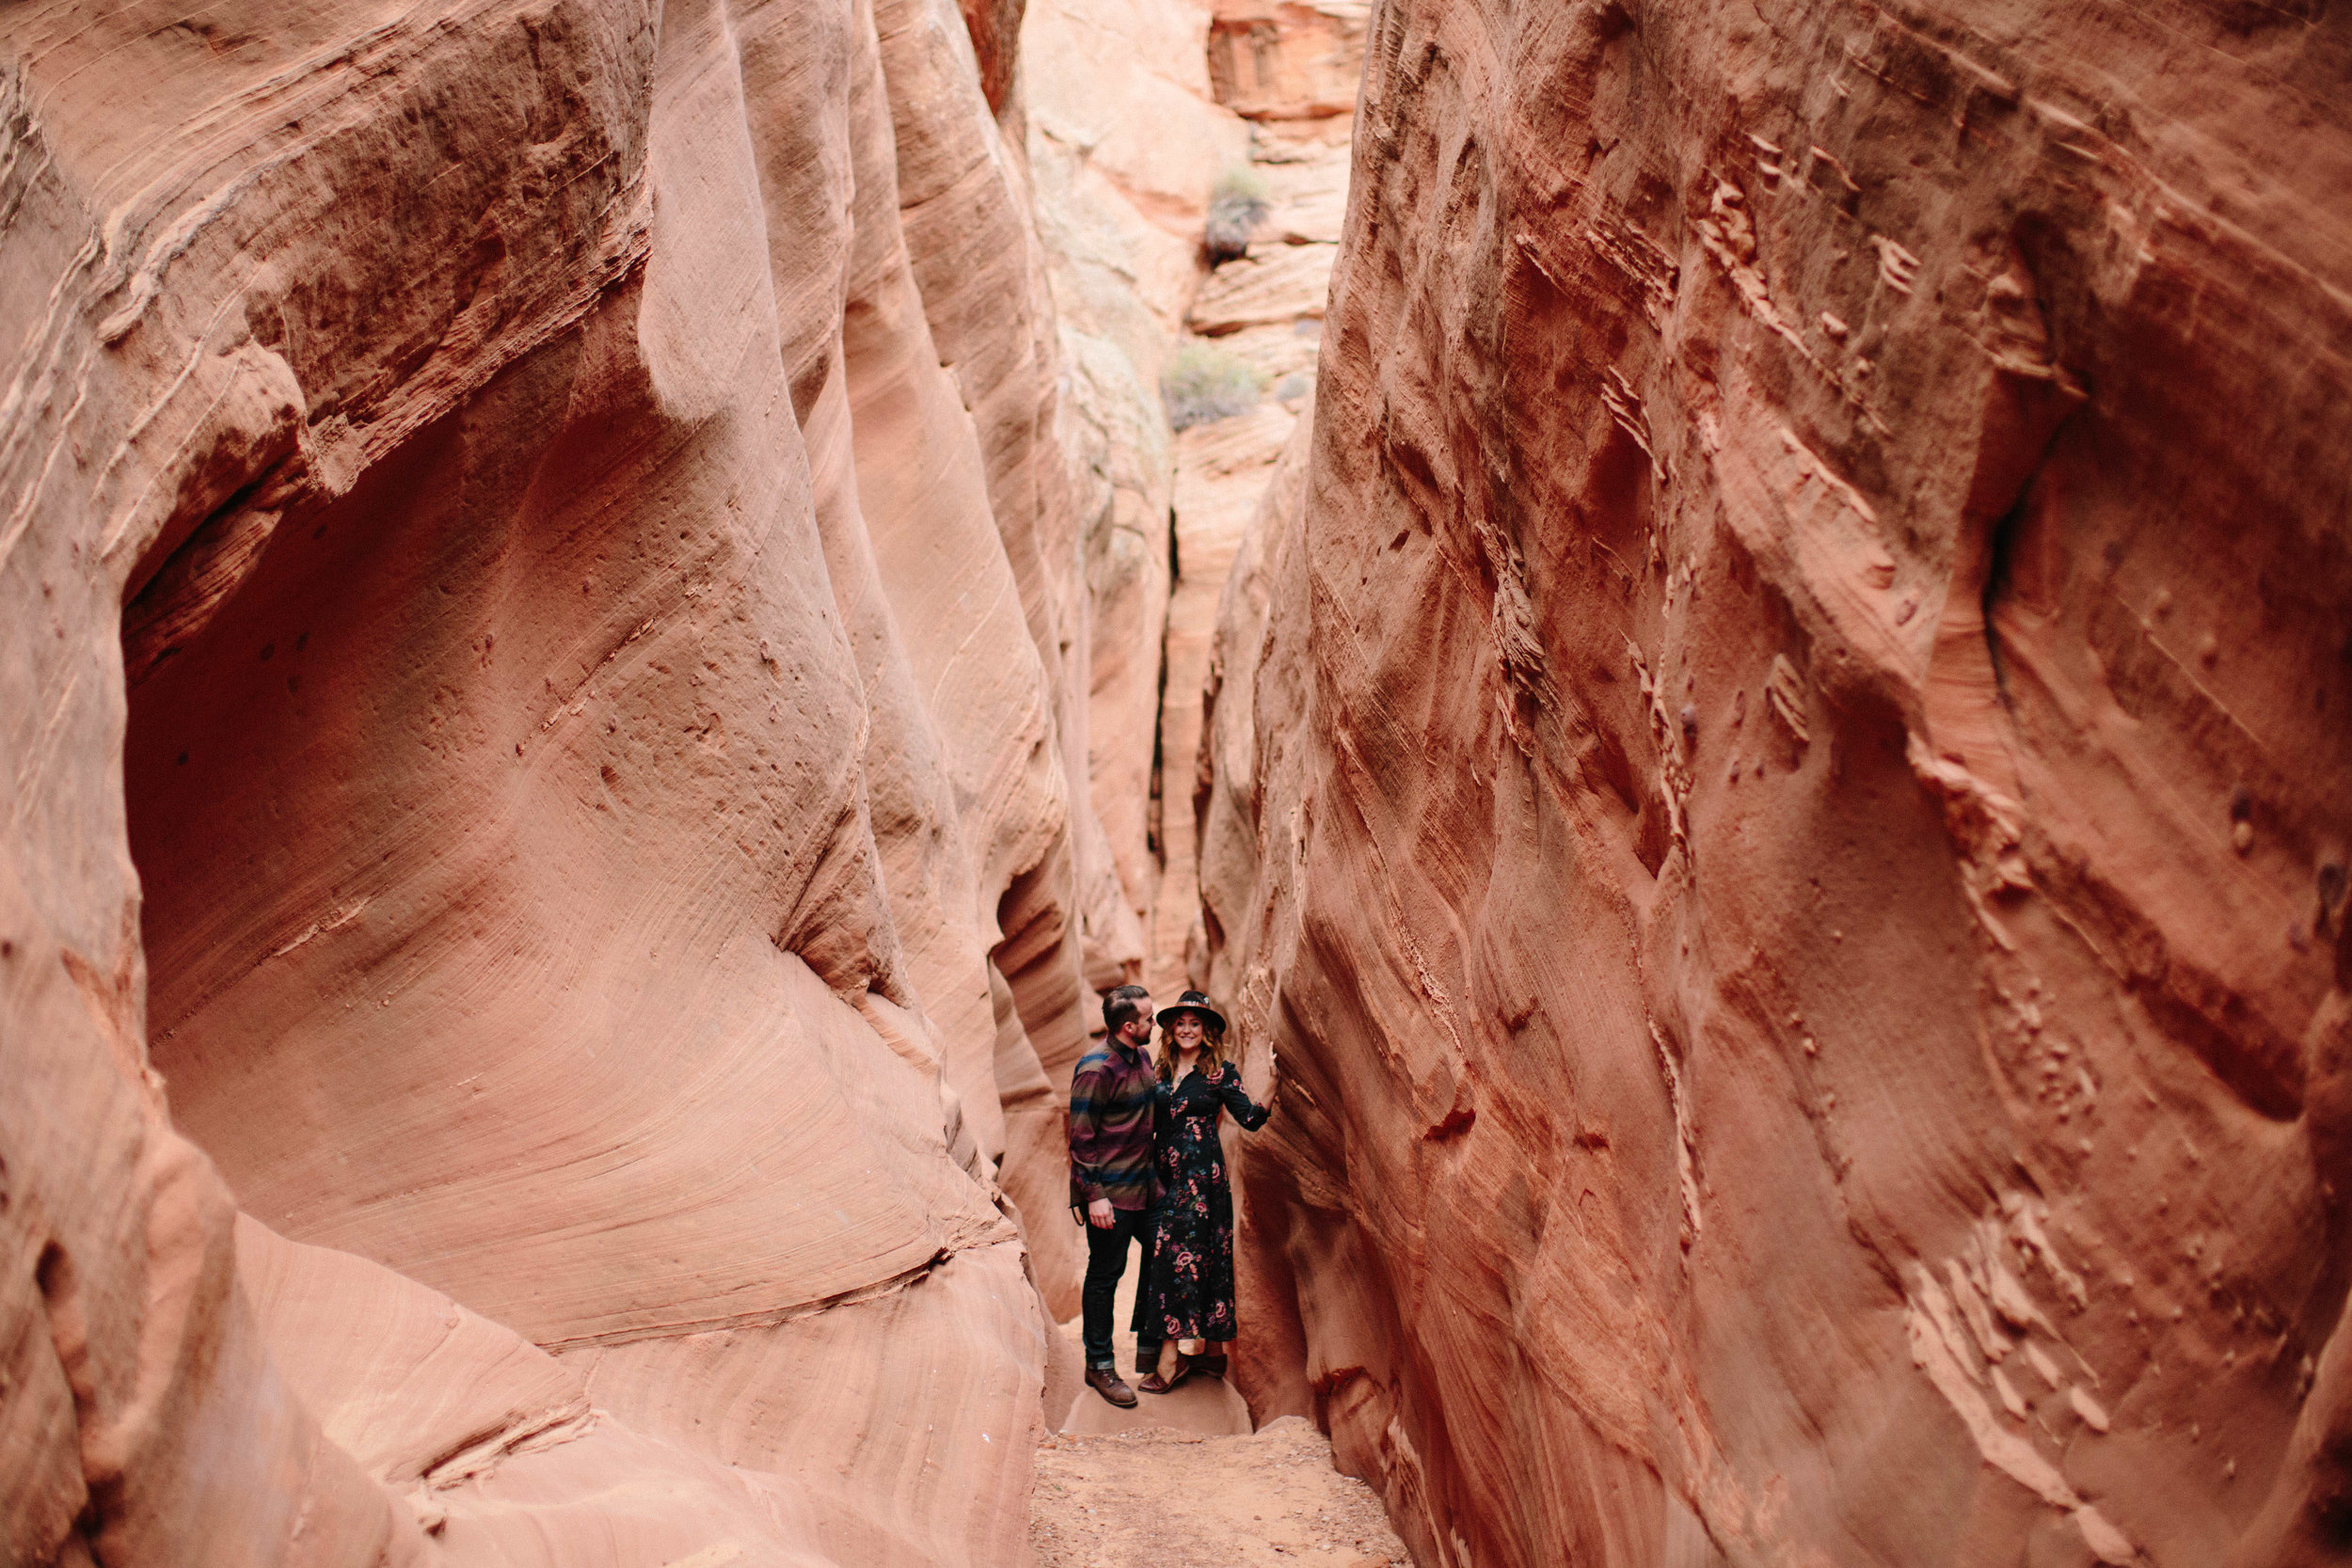 Arizona Engagement Session | Benjamin Hewitt Photography | Antelope Canyon - Waterhole Canyon